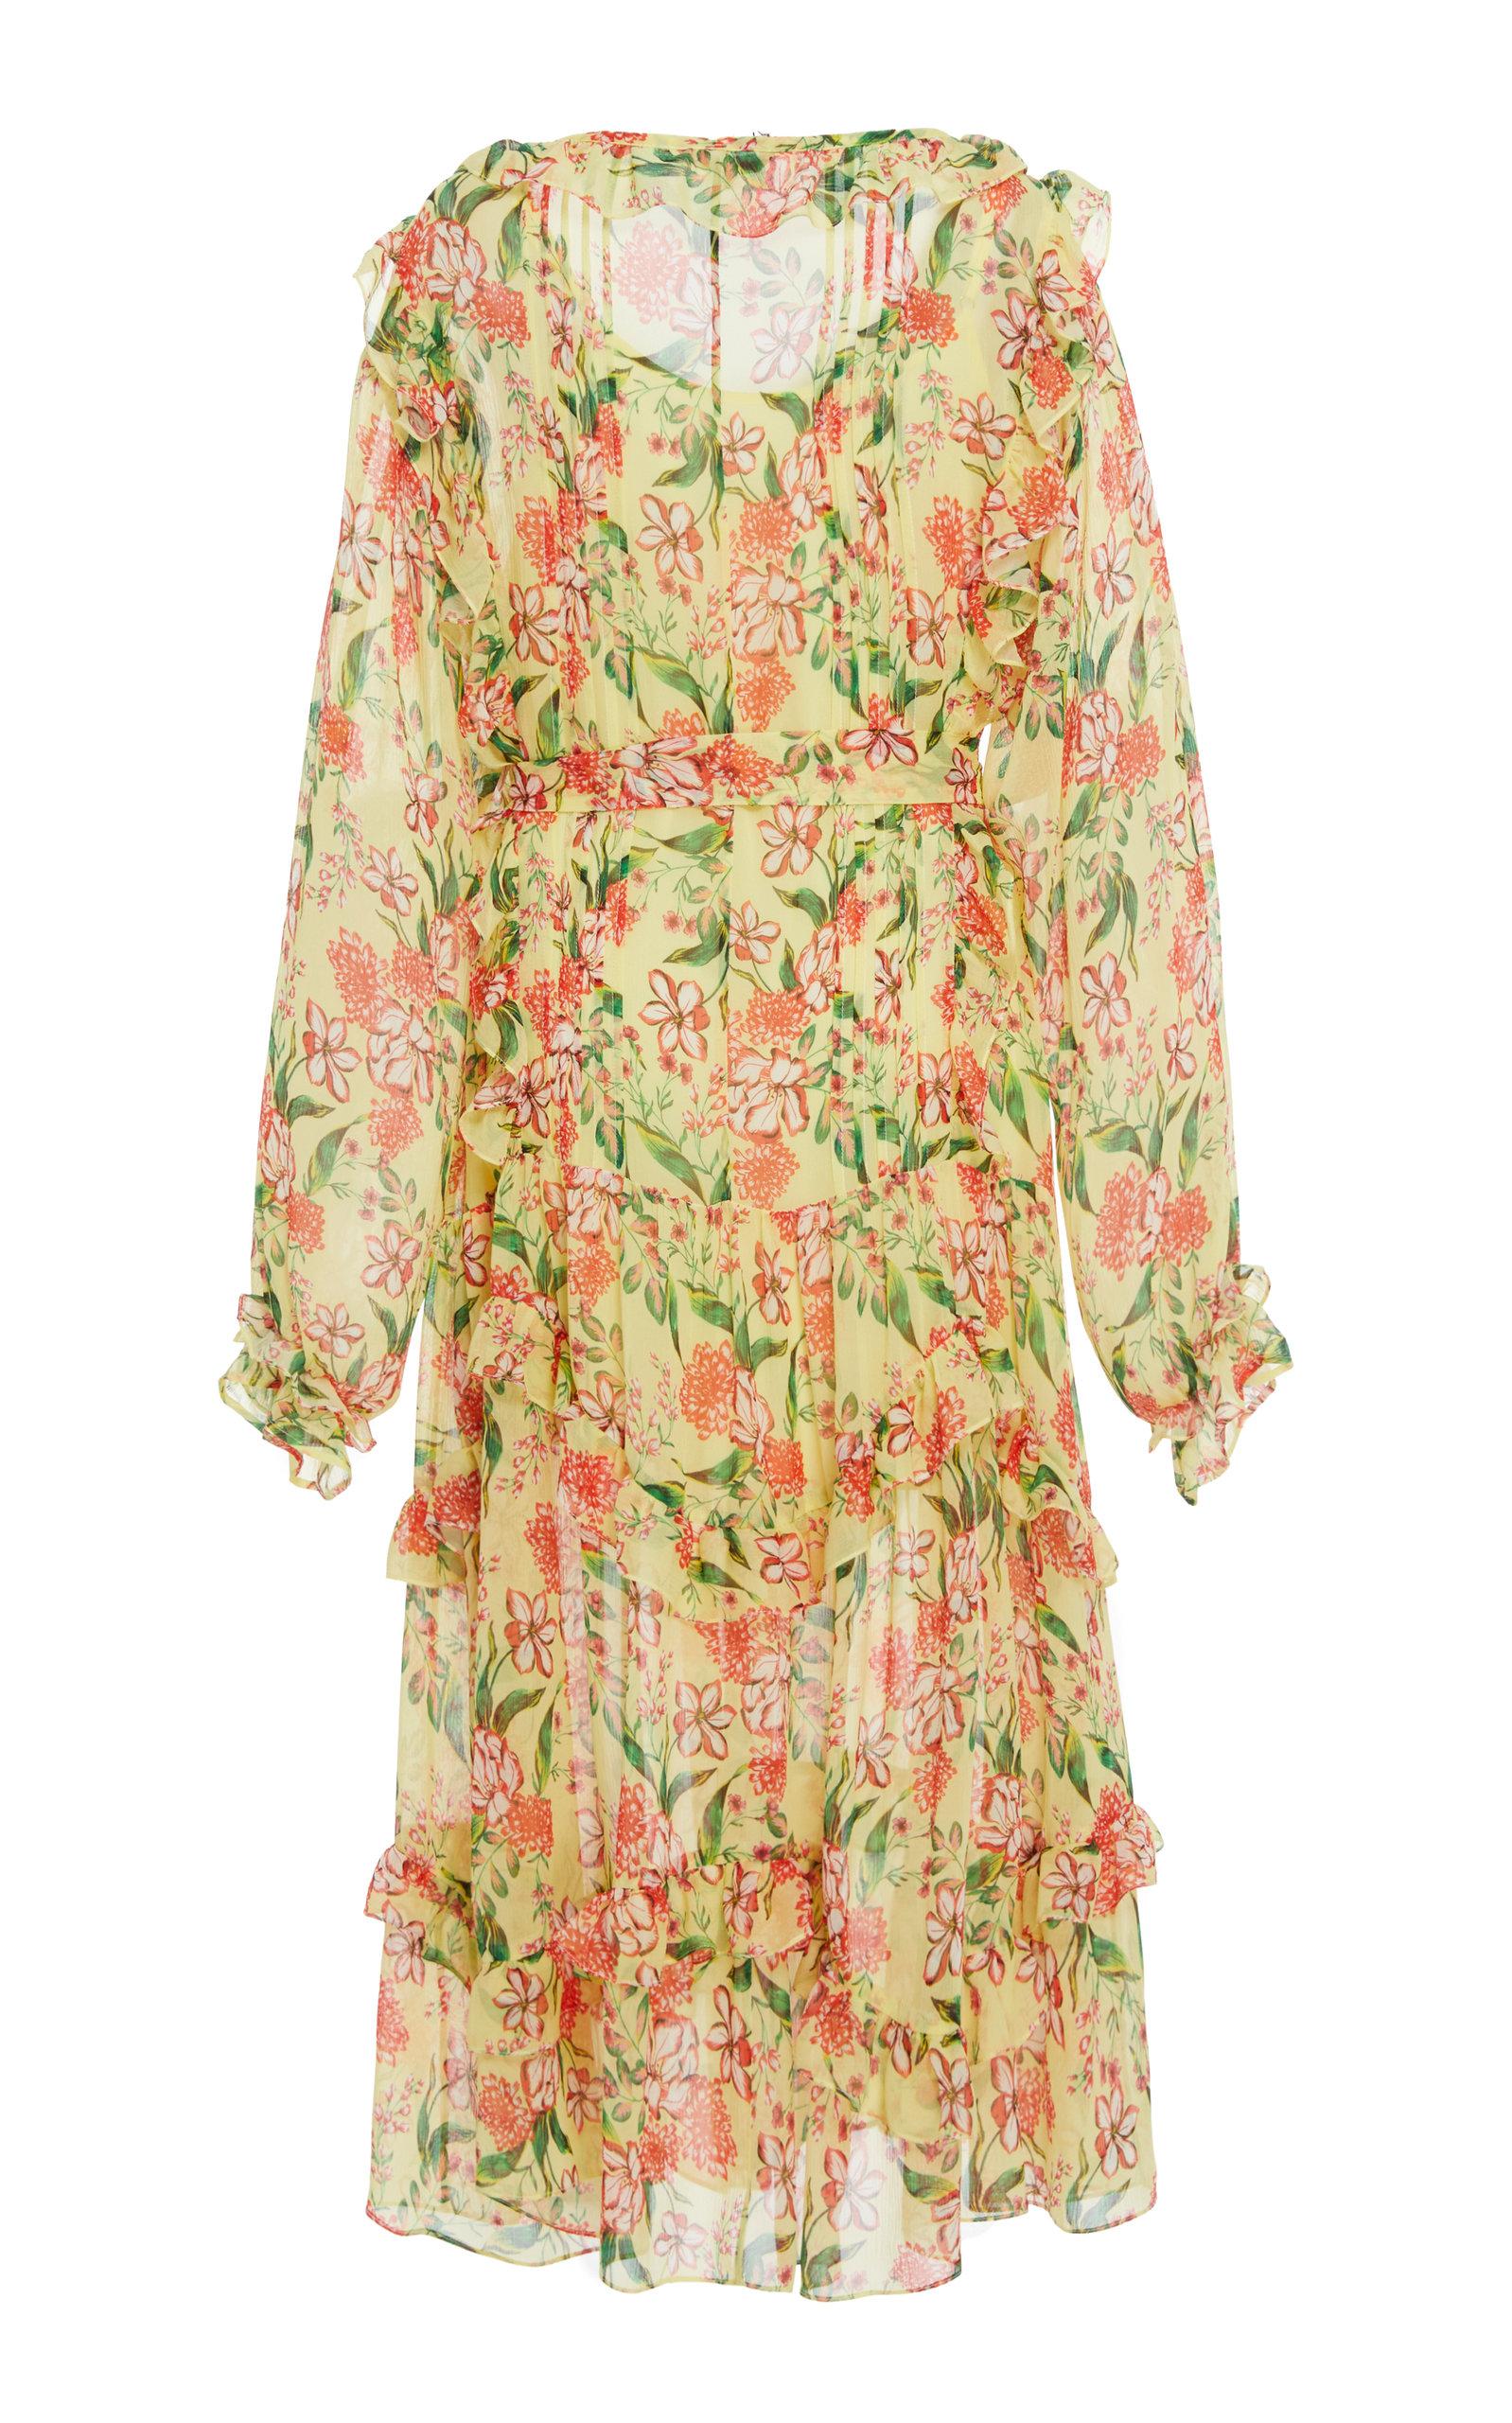 Everett Silk Print Dress Marissa Webb Sale Cheapest Price Discount Low Shipping Fee Footlocker Sale Online SbHTa